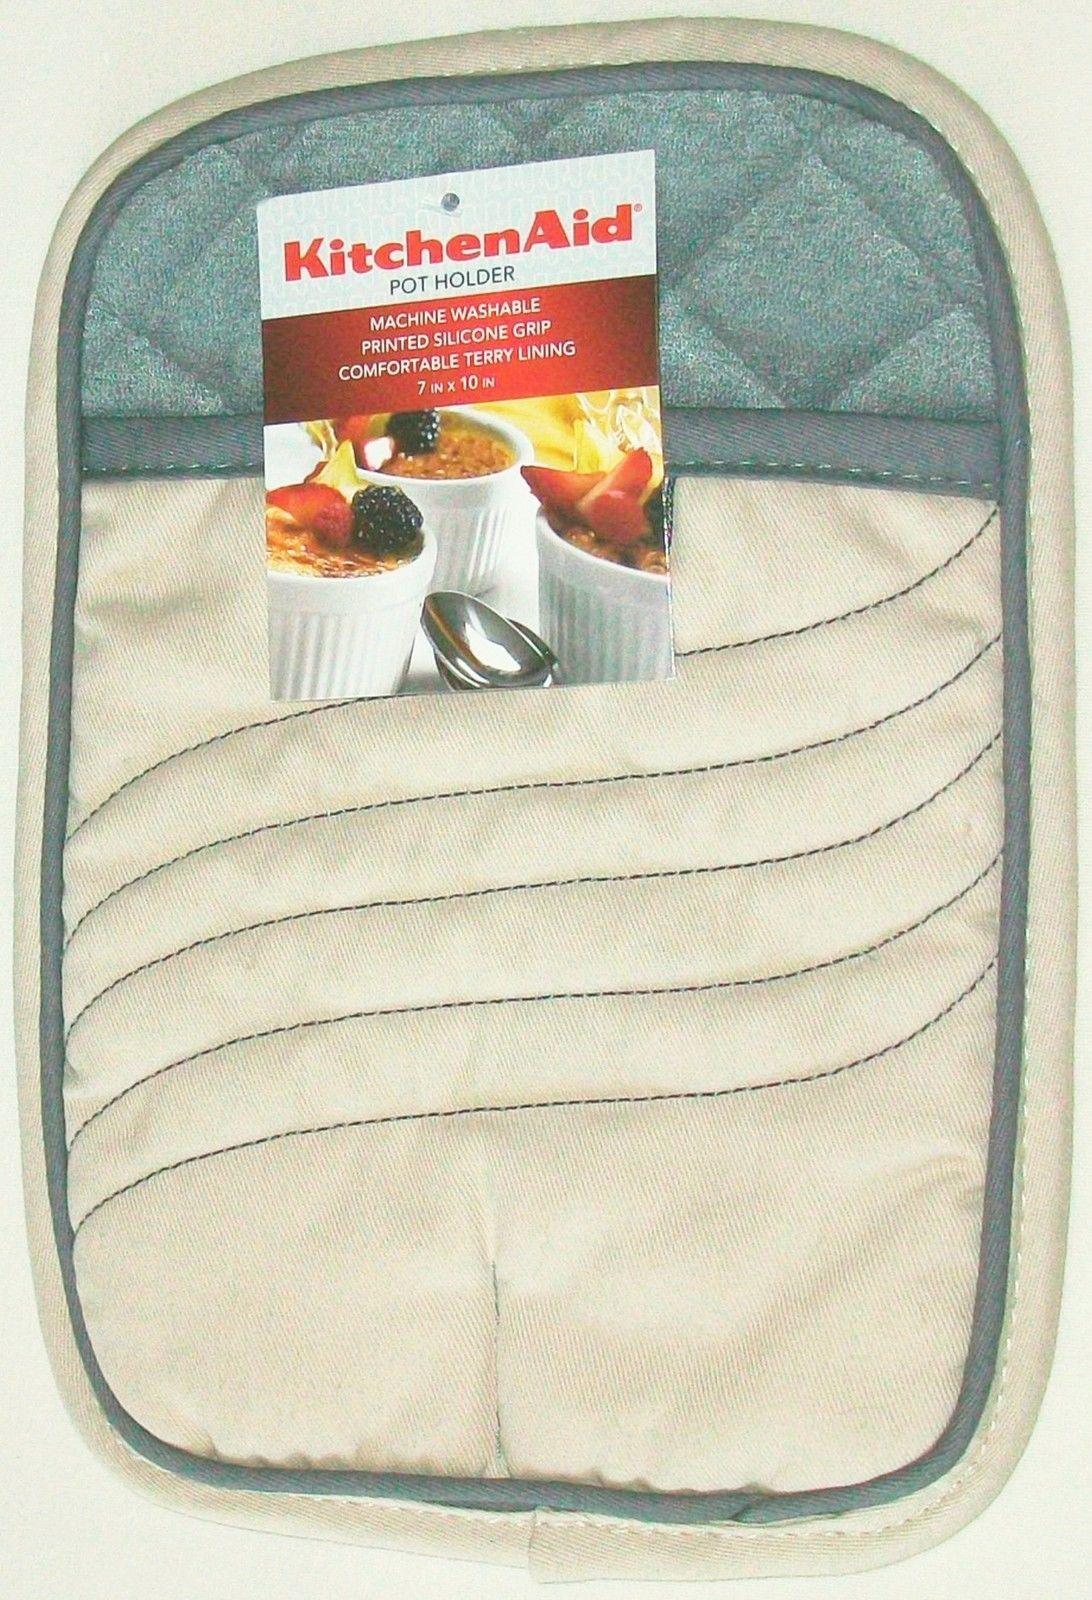 Kitchenaid 100 cotton sand beige 7 x10 printed silicone grip pot holder new oven mitts - Kitchenaid oven gloves ...